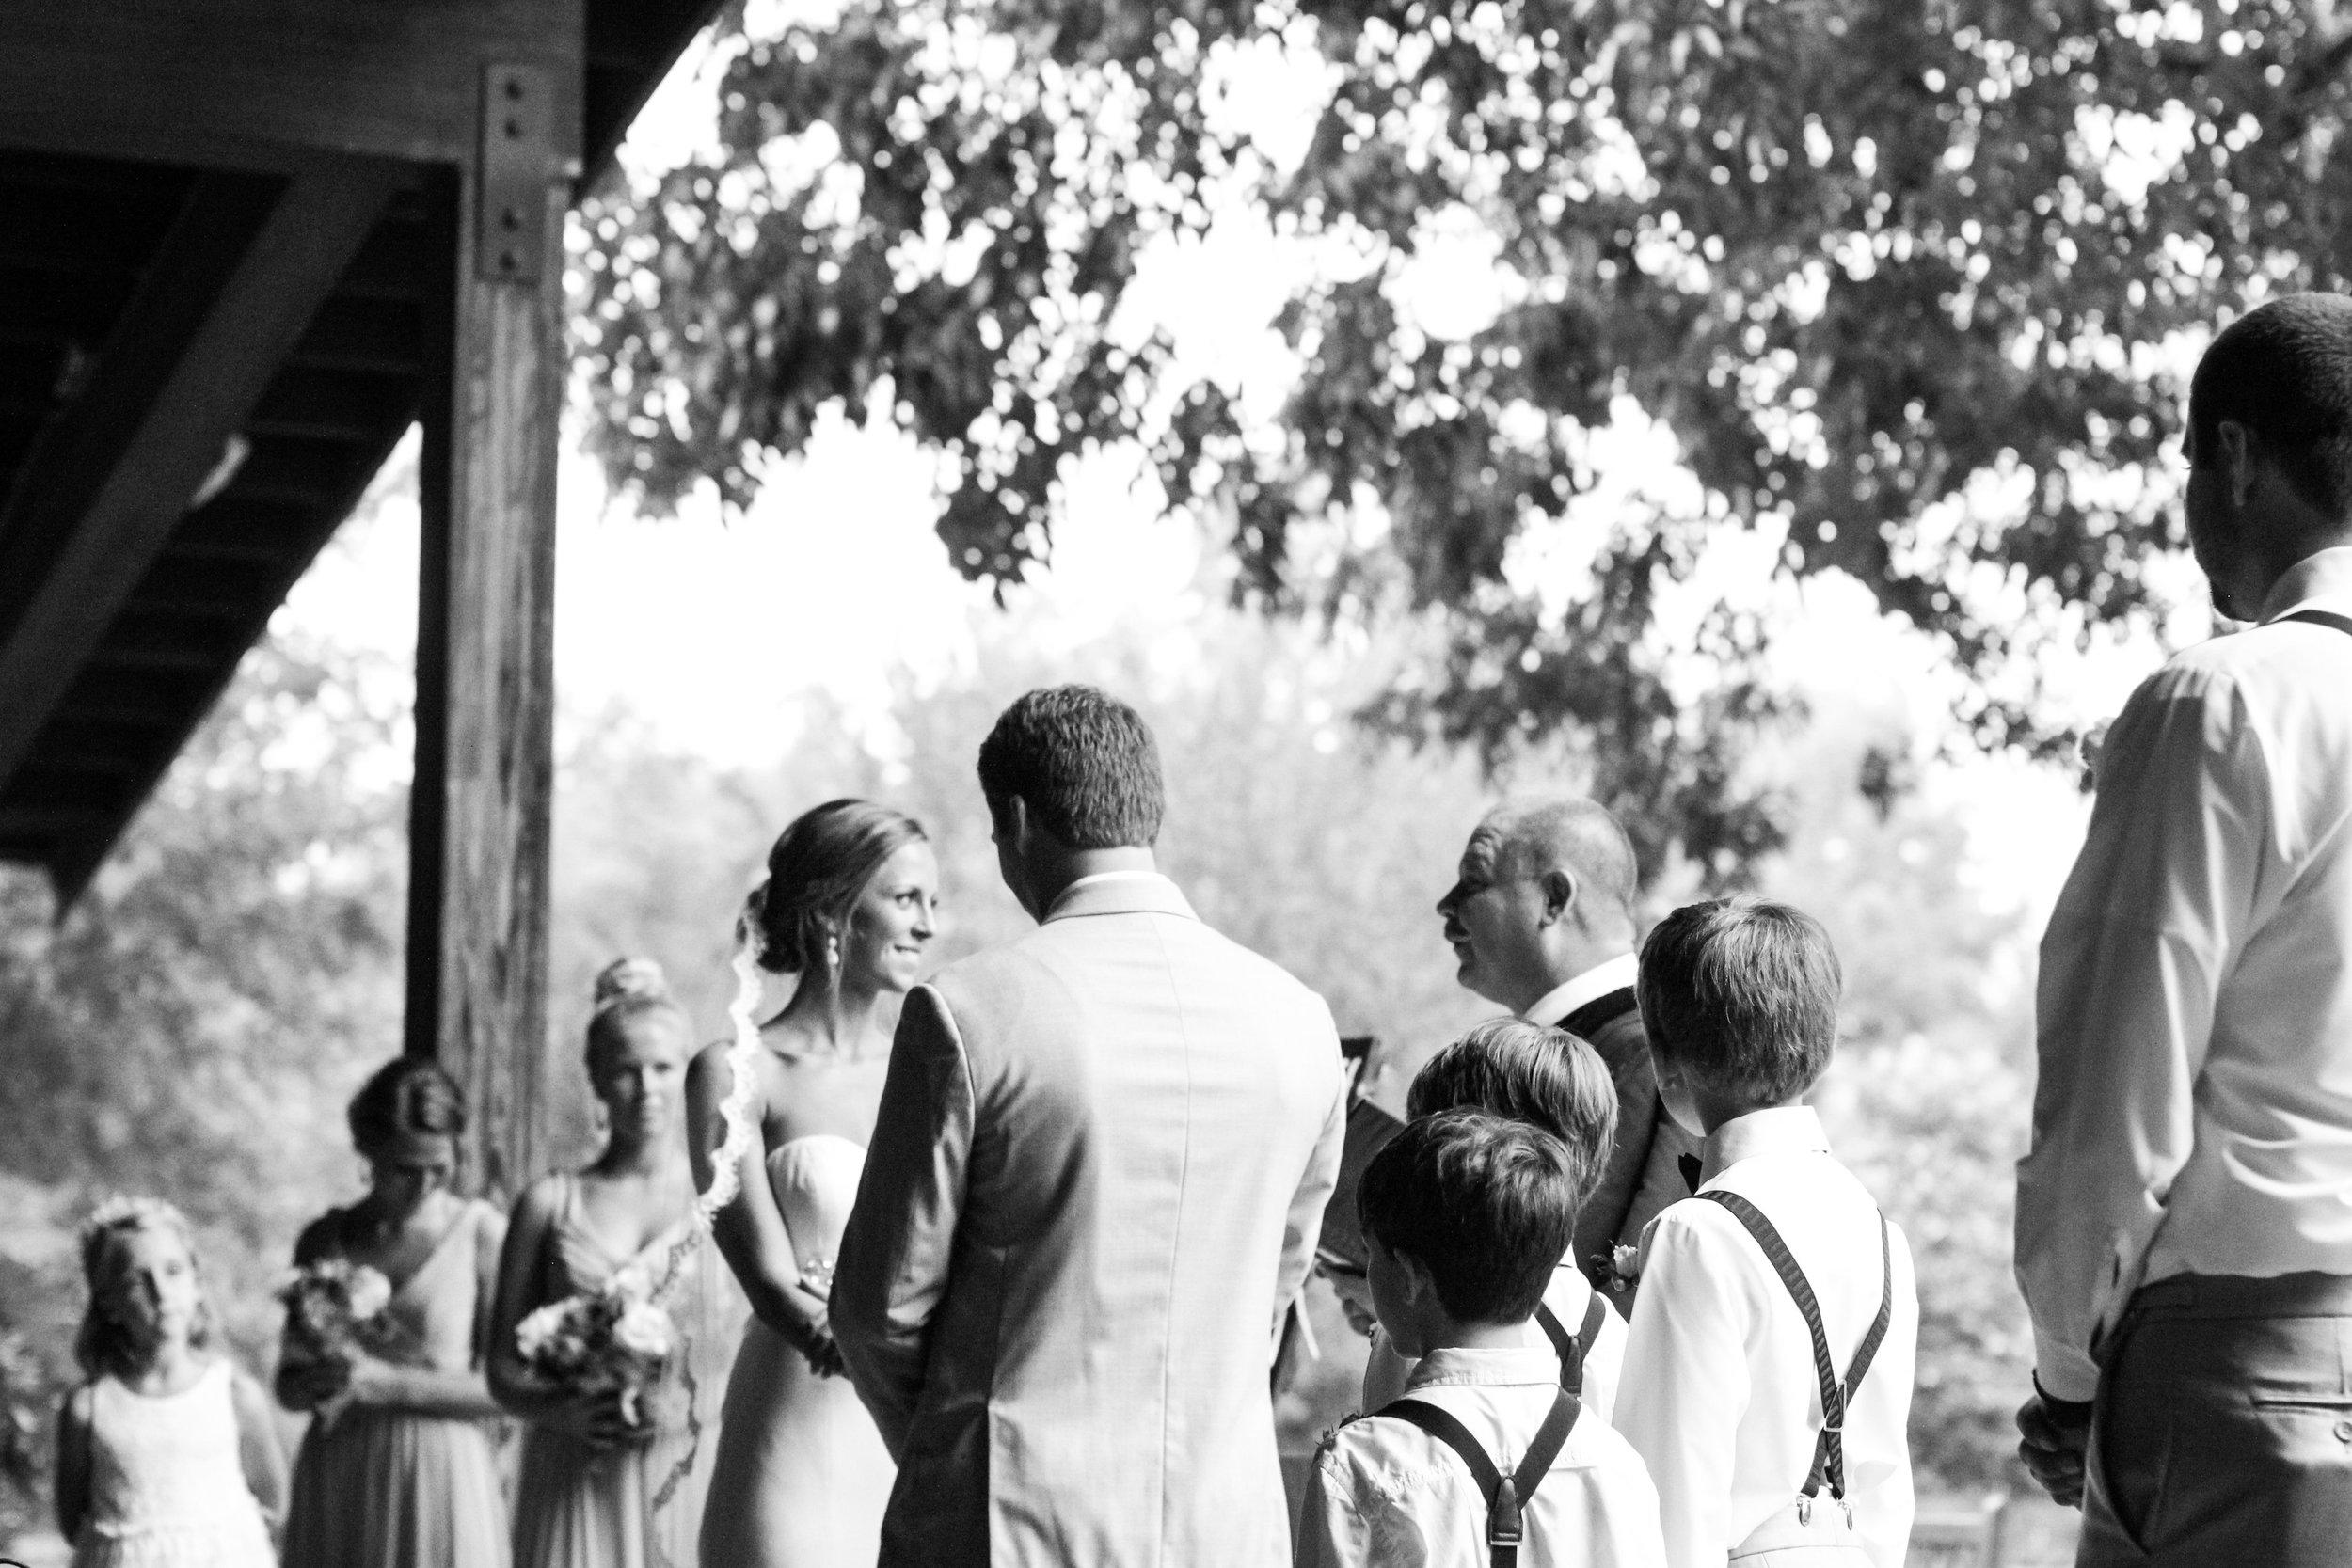 finnegan-photography-ivory-and-beau-bridal-boutique-nicole-miller-dakota-jaclyn-jordan-anne-veil-savannah-bridal-boutique-savannah-wedding-dresses-savannah-weddings-statesboro-wedding-barn-wedding-savannah-bridal-georgia-bridal-boutique-13.jpg